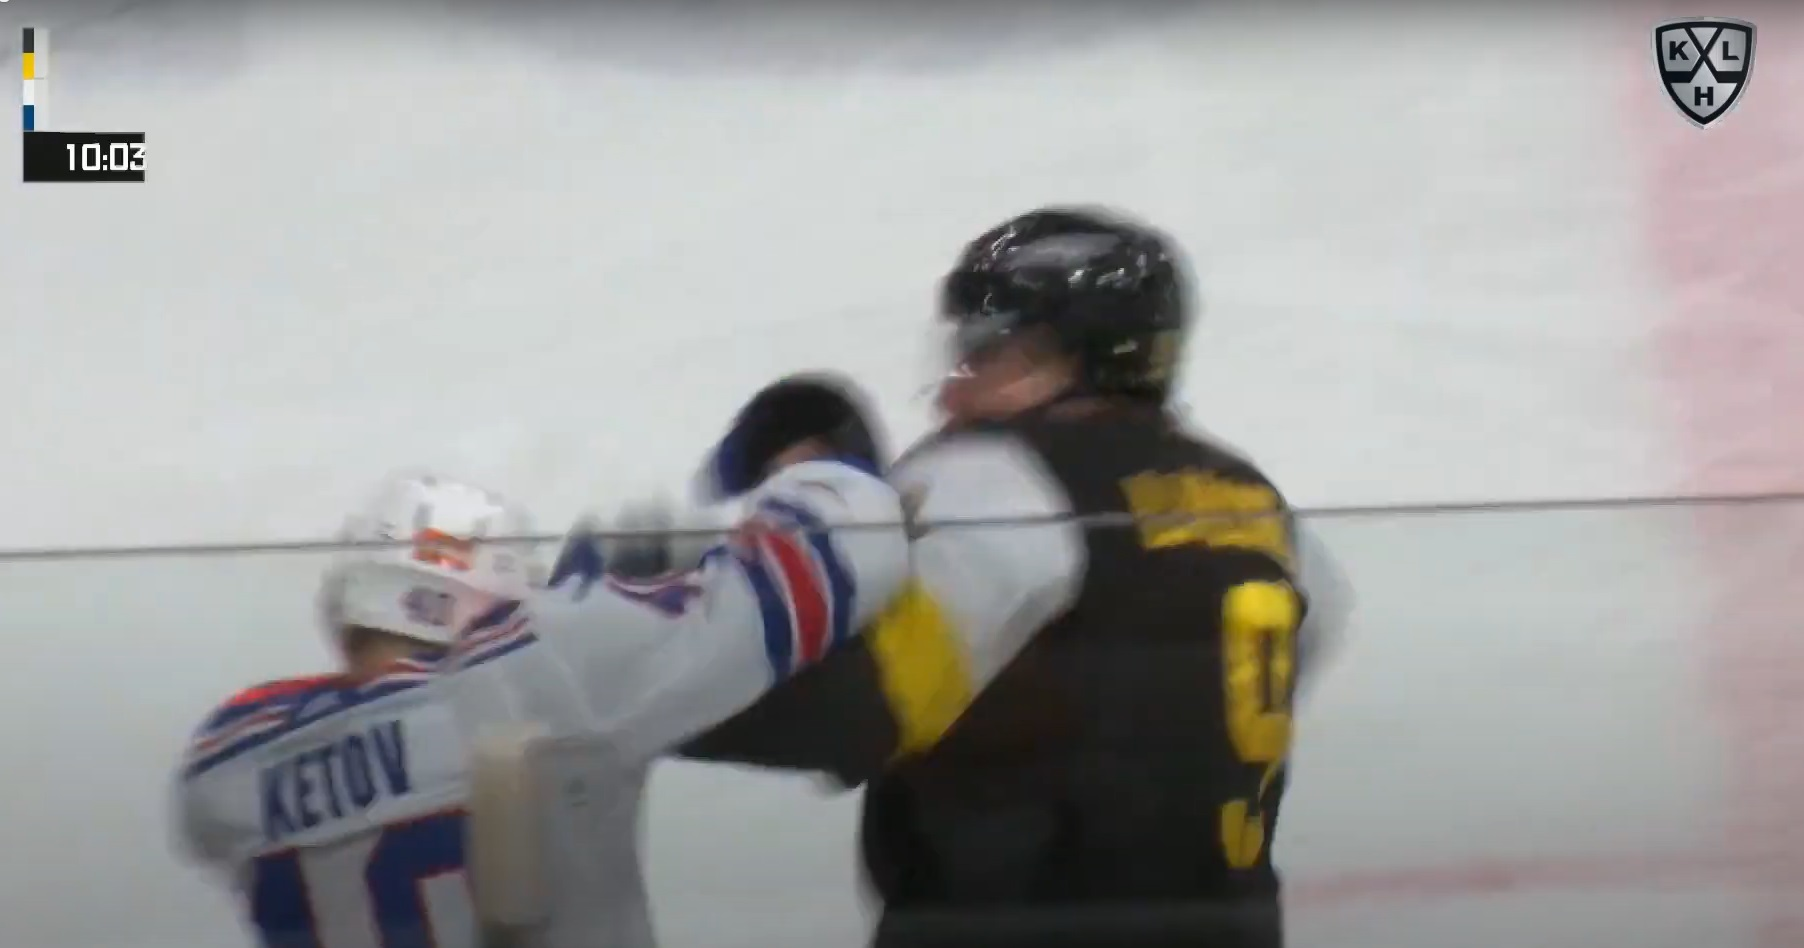 Shawn Lalonde vs. Evgeny Ketov